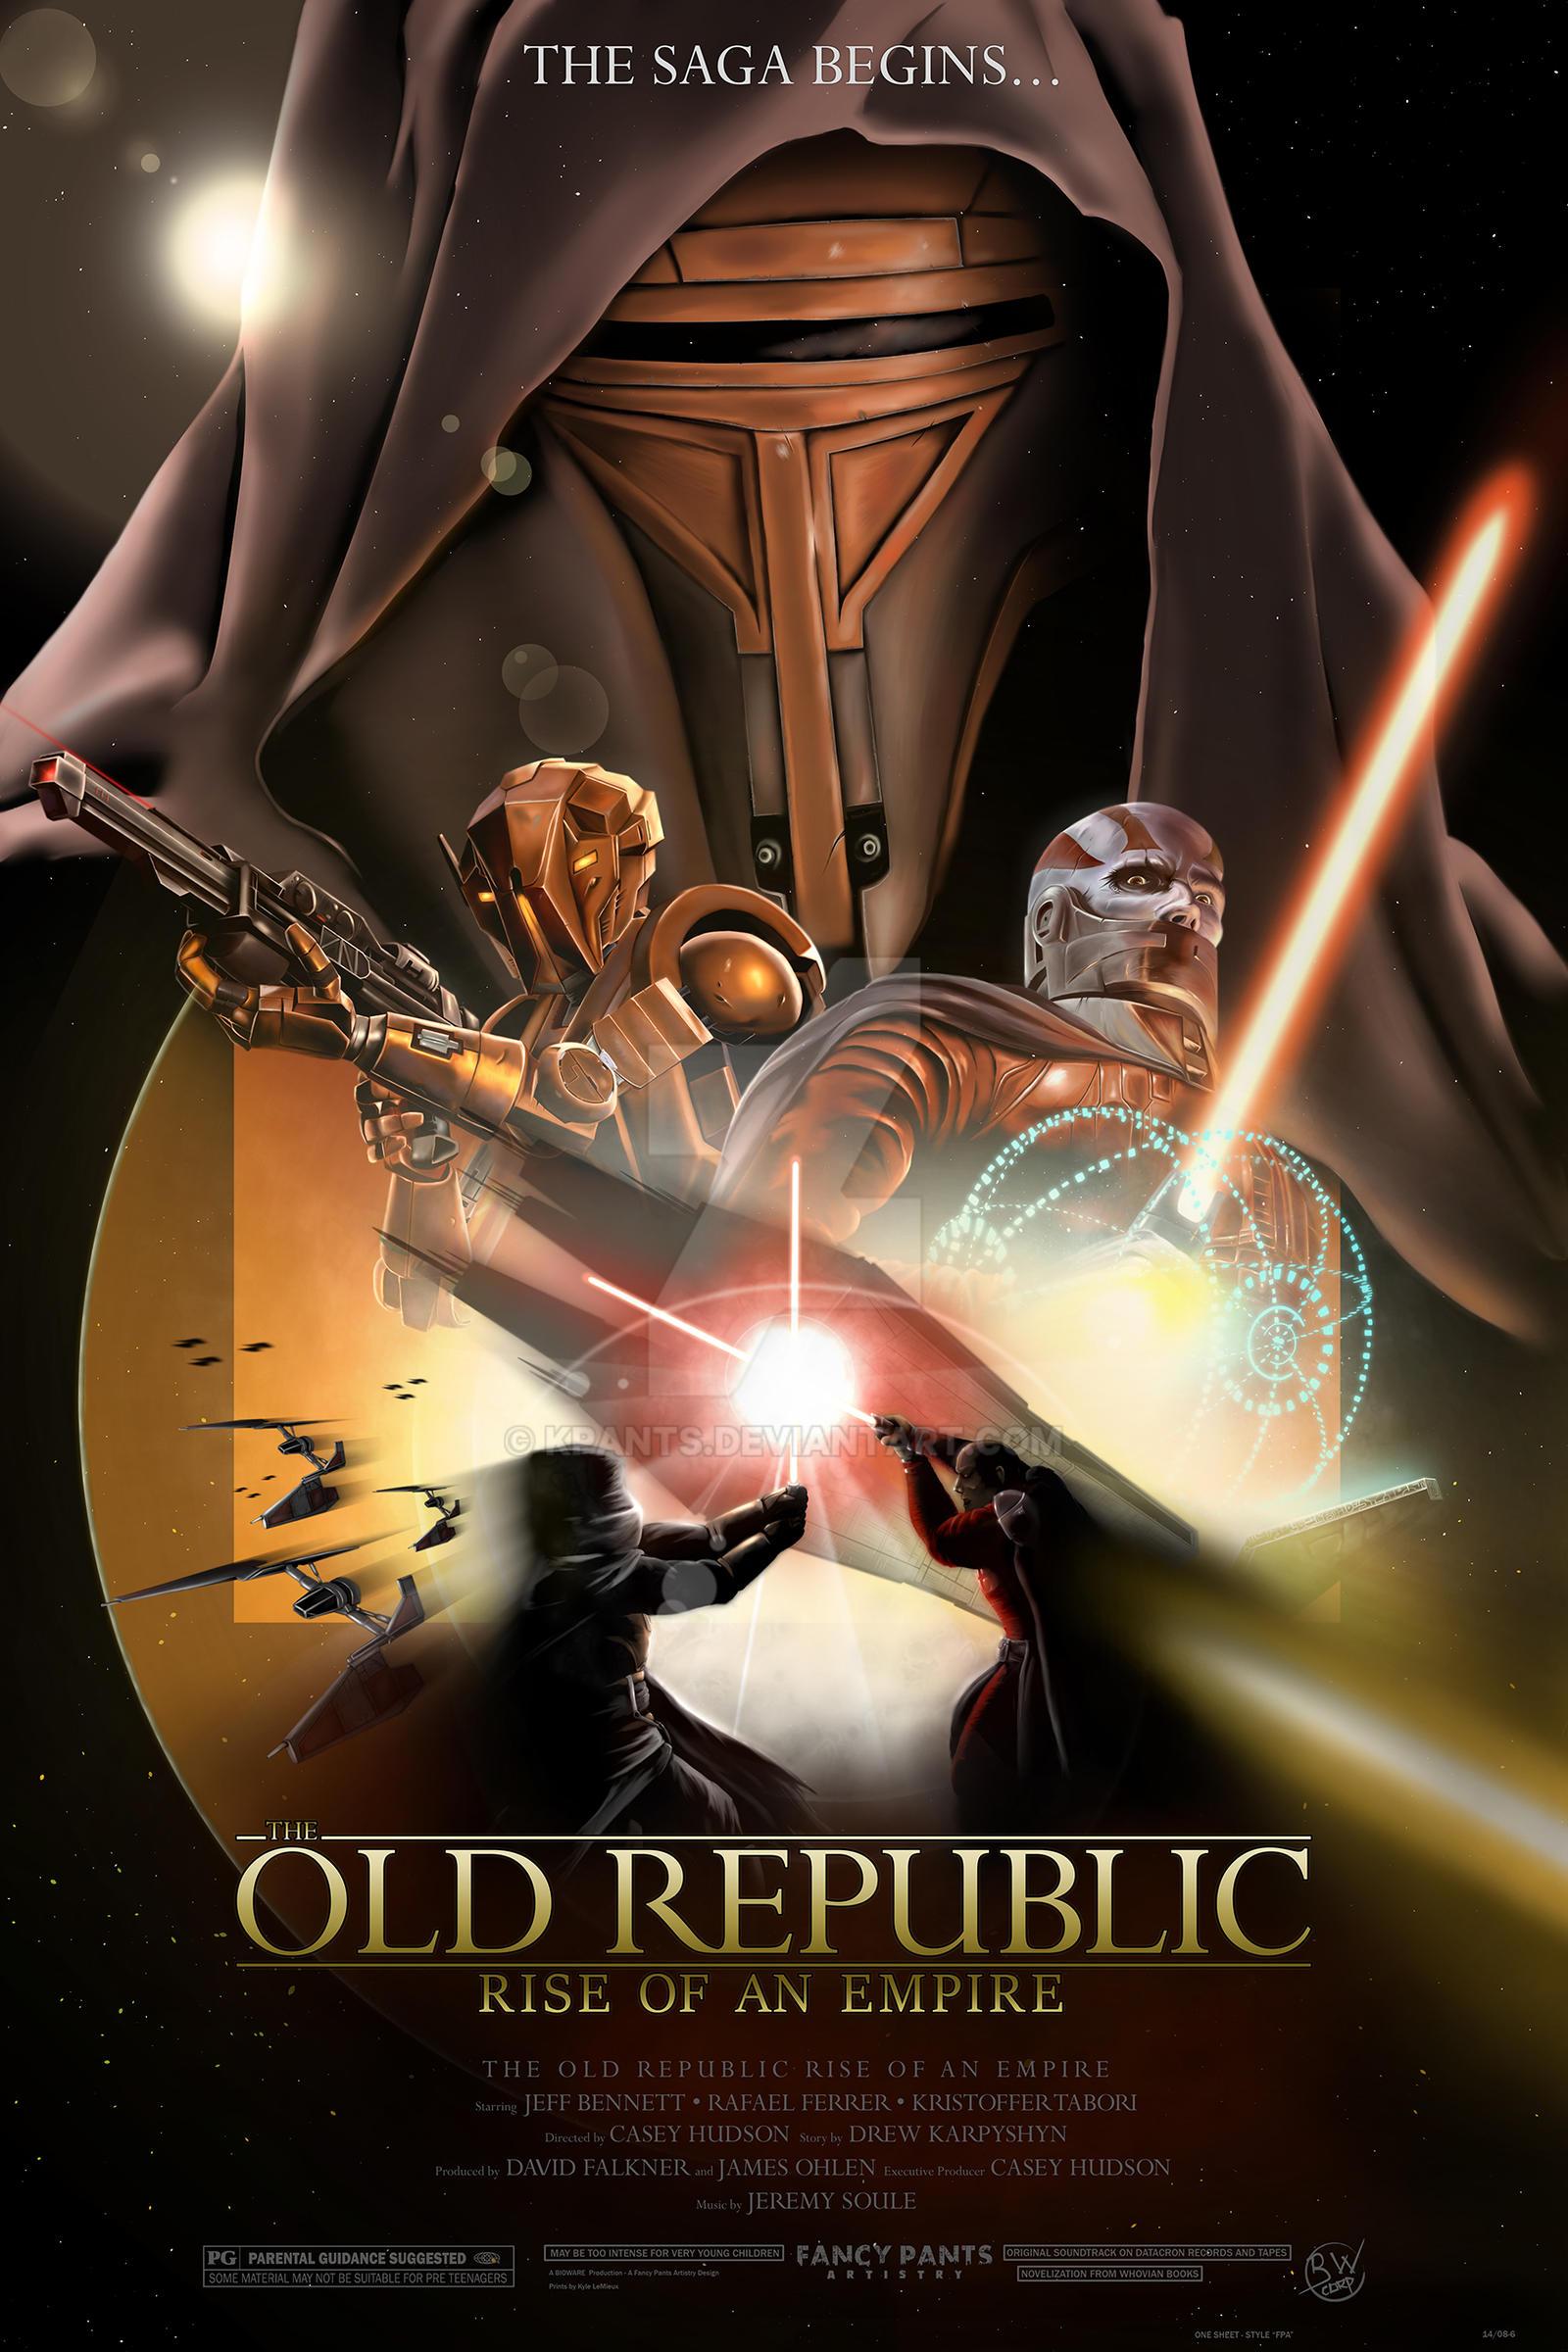 Rian Johnson to create New Star Wars Trilogy | ResetEra